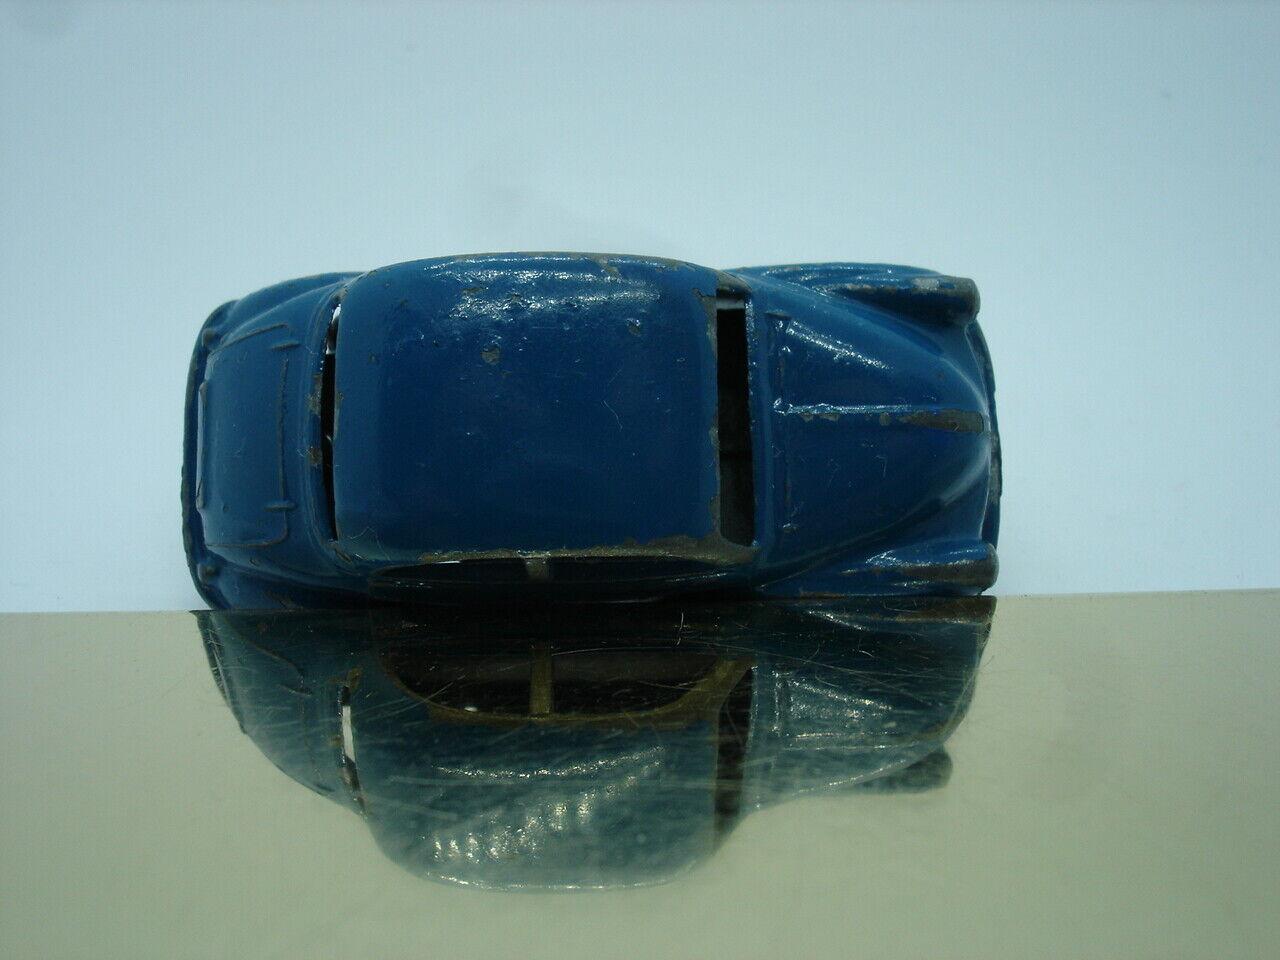 MATCHBOX 1-75 Petit Moko Lesney nº 46 a Morris Minor 1000 1958 54 mm grisepr Bleu